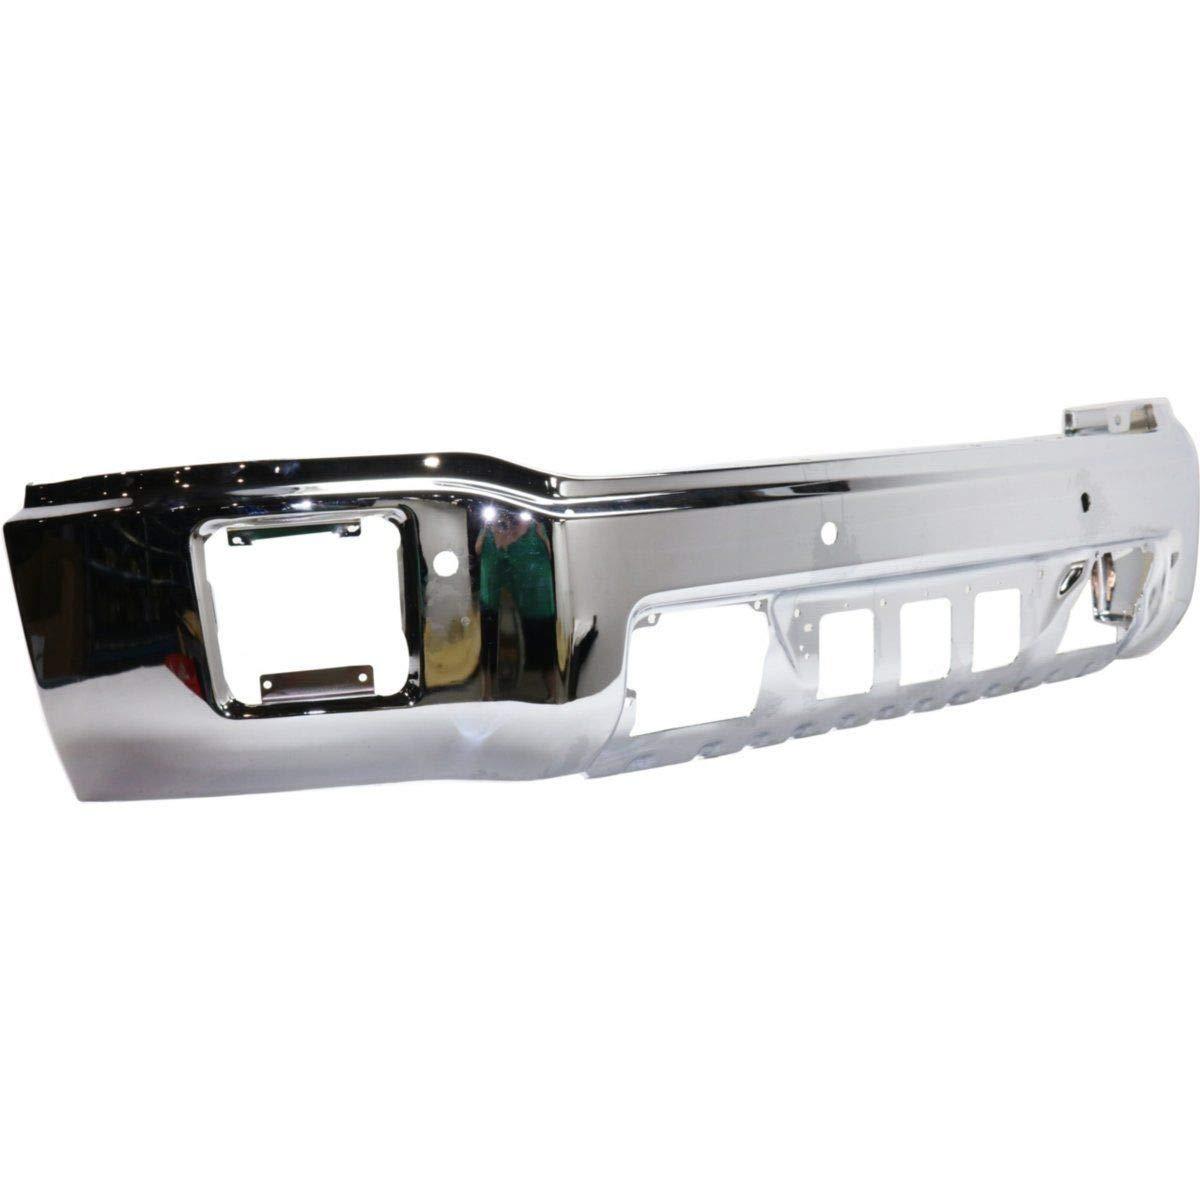 GM1002847 Steel Front Bumper Face Bar for 2014-2015 GMC Sierra 1500 Series w//Park Assist 14-15 MBI AUTO Chrome